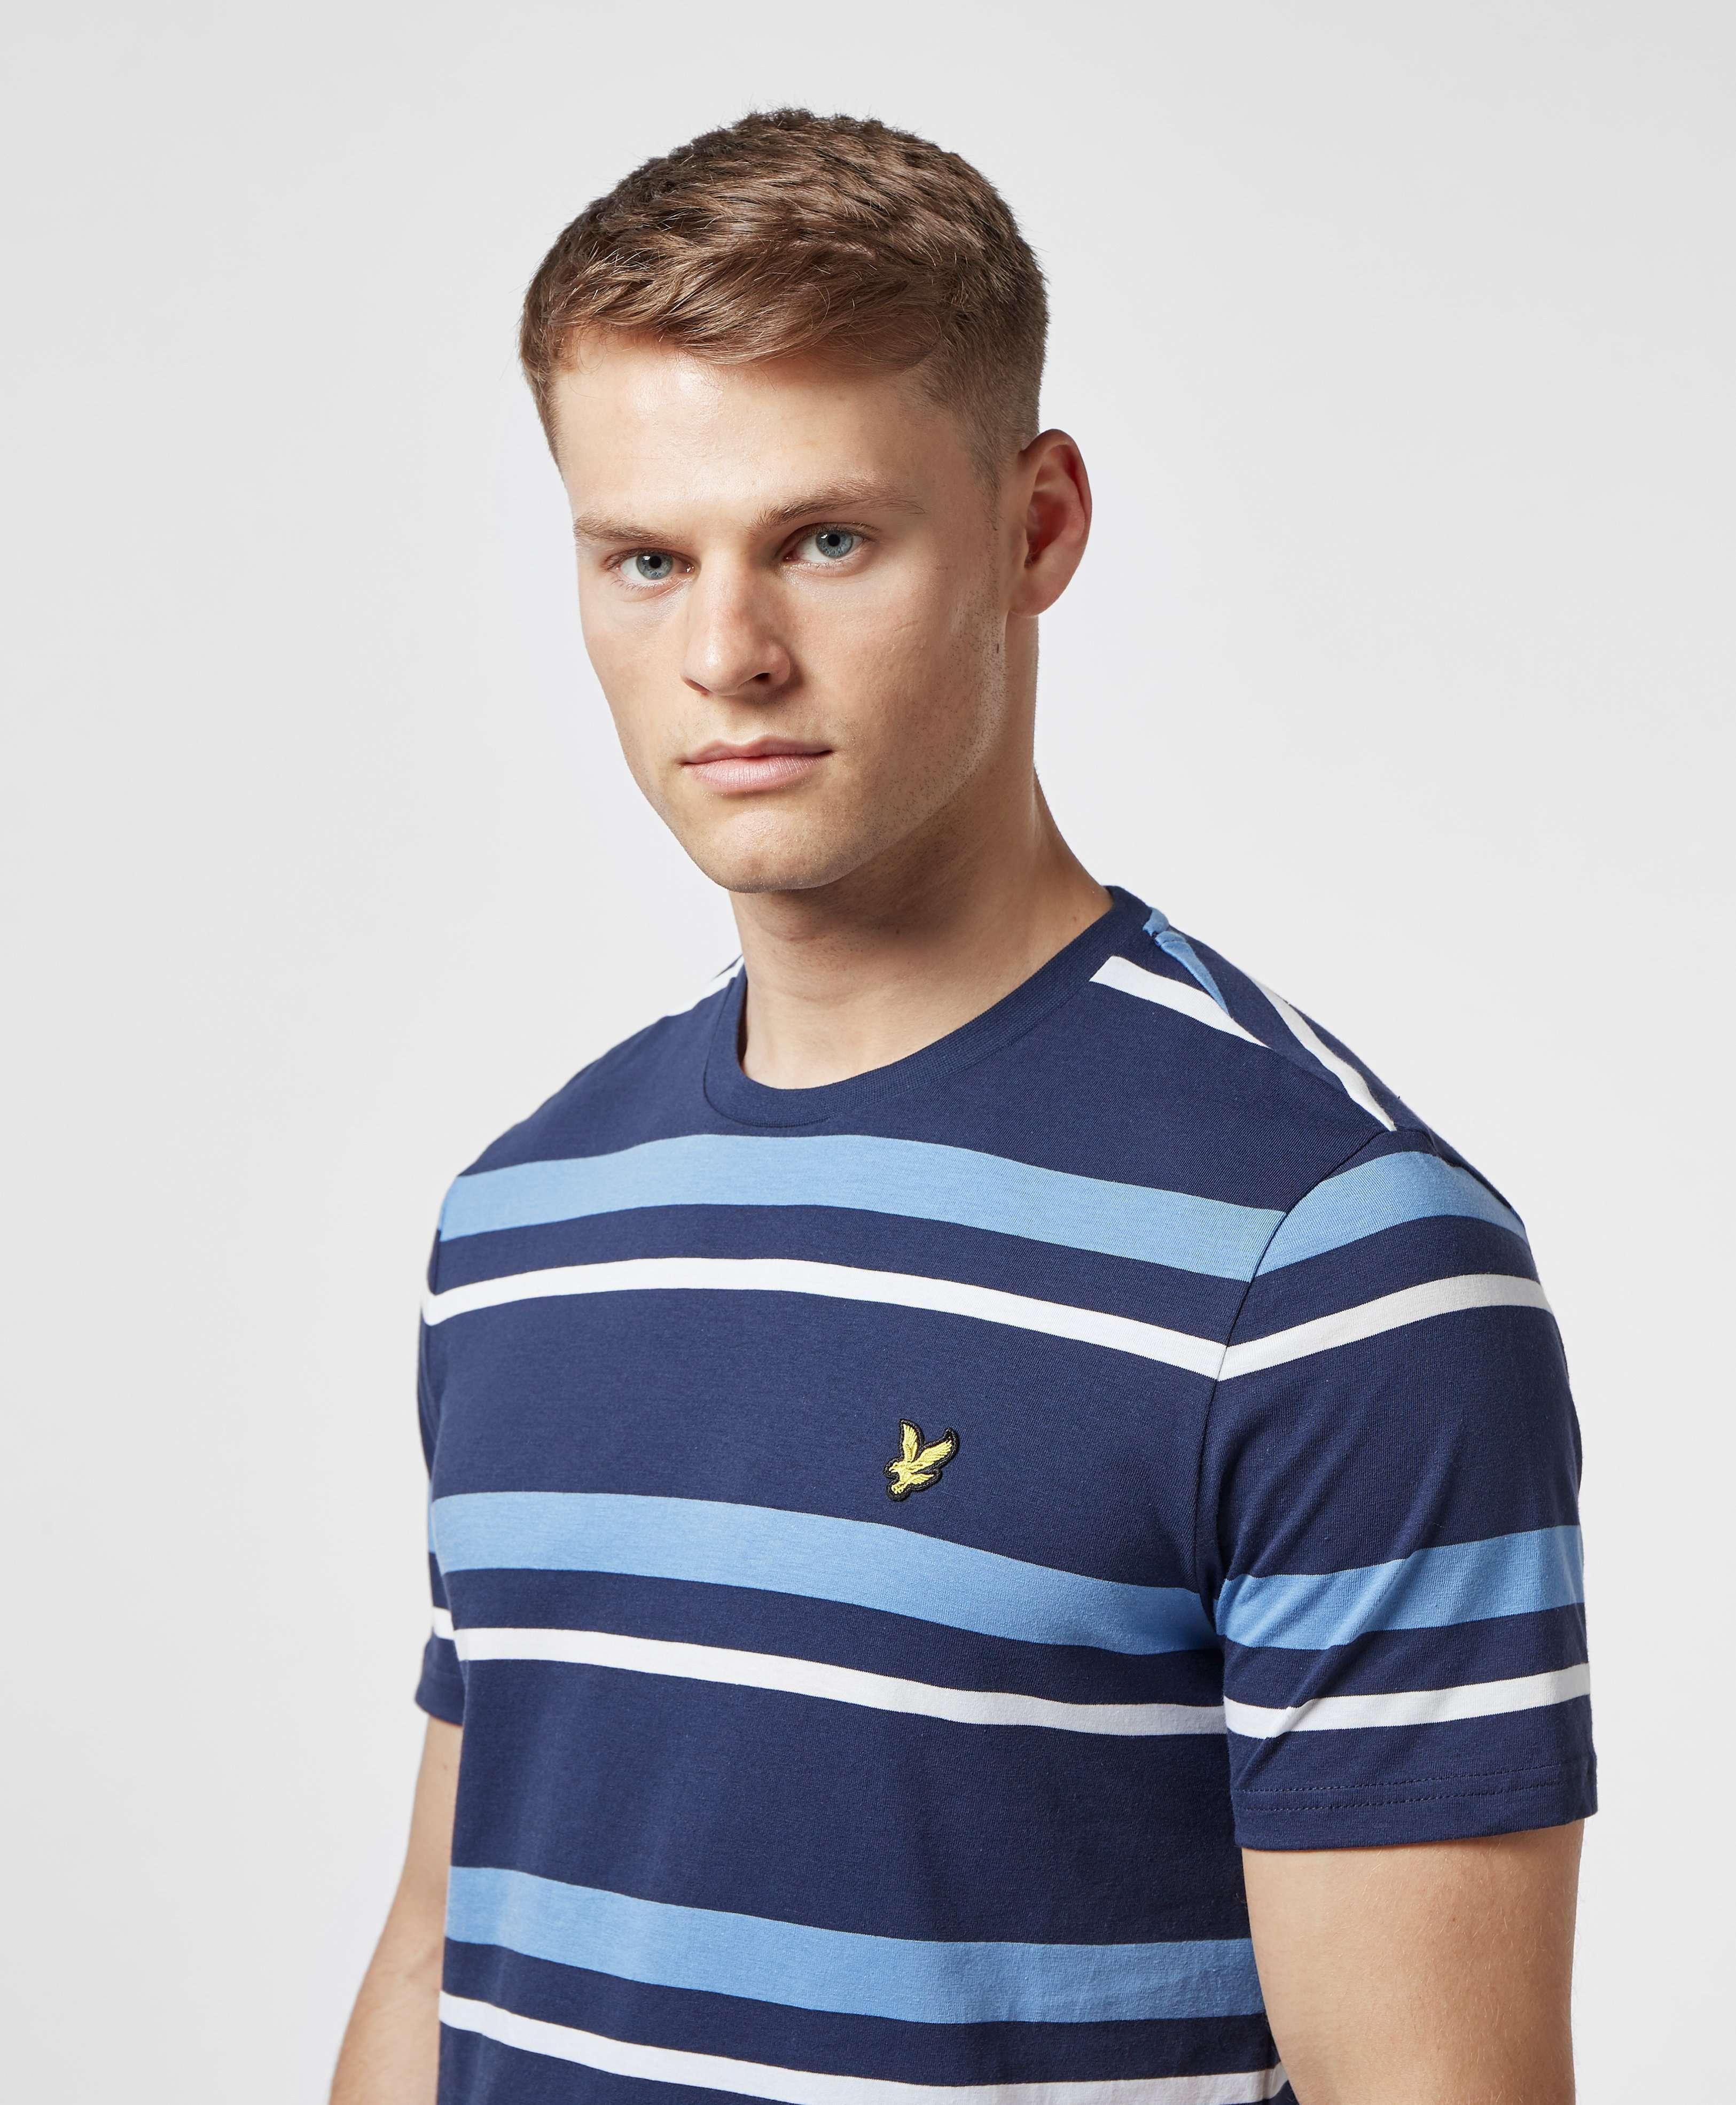 Lyle & Scott Stripe Short Sleeve T-Shirt - Online Exclusive